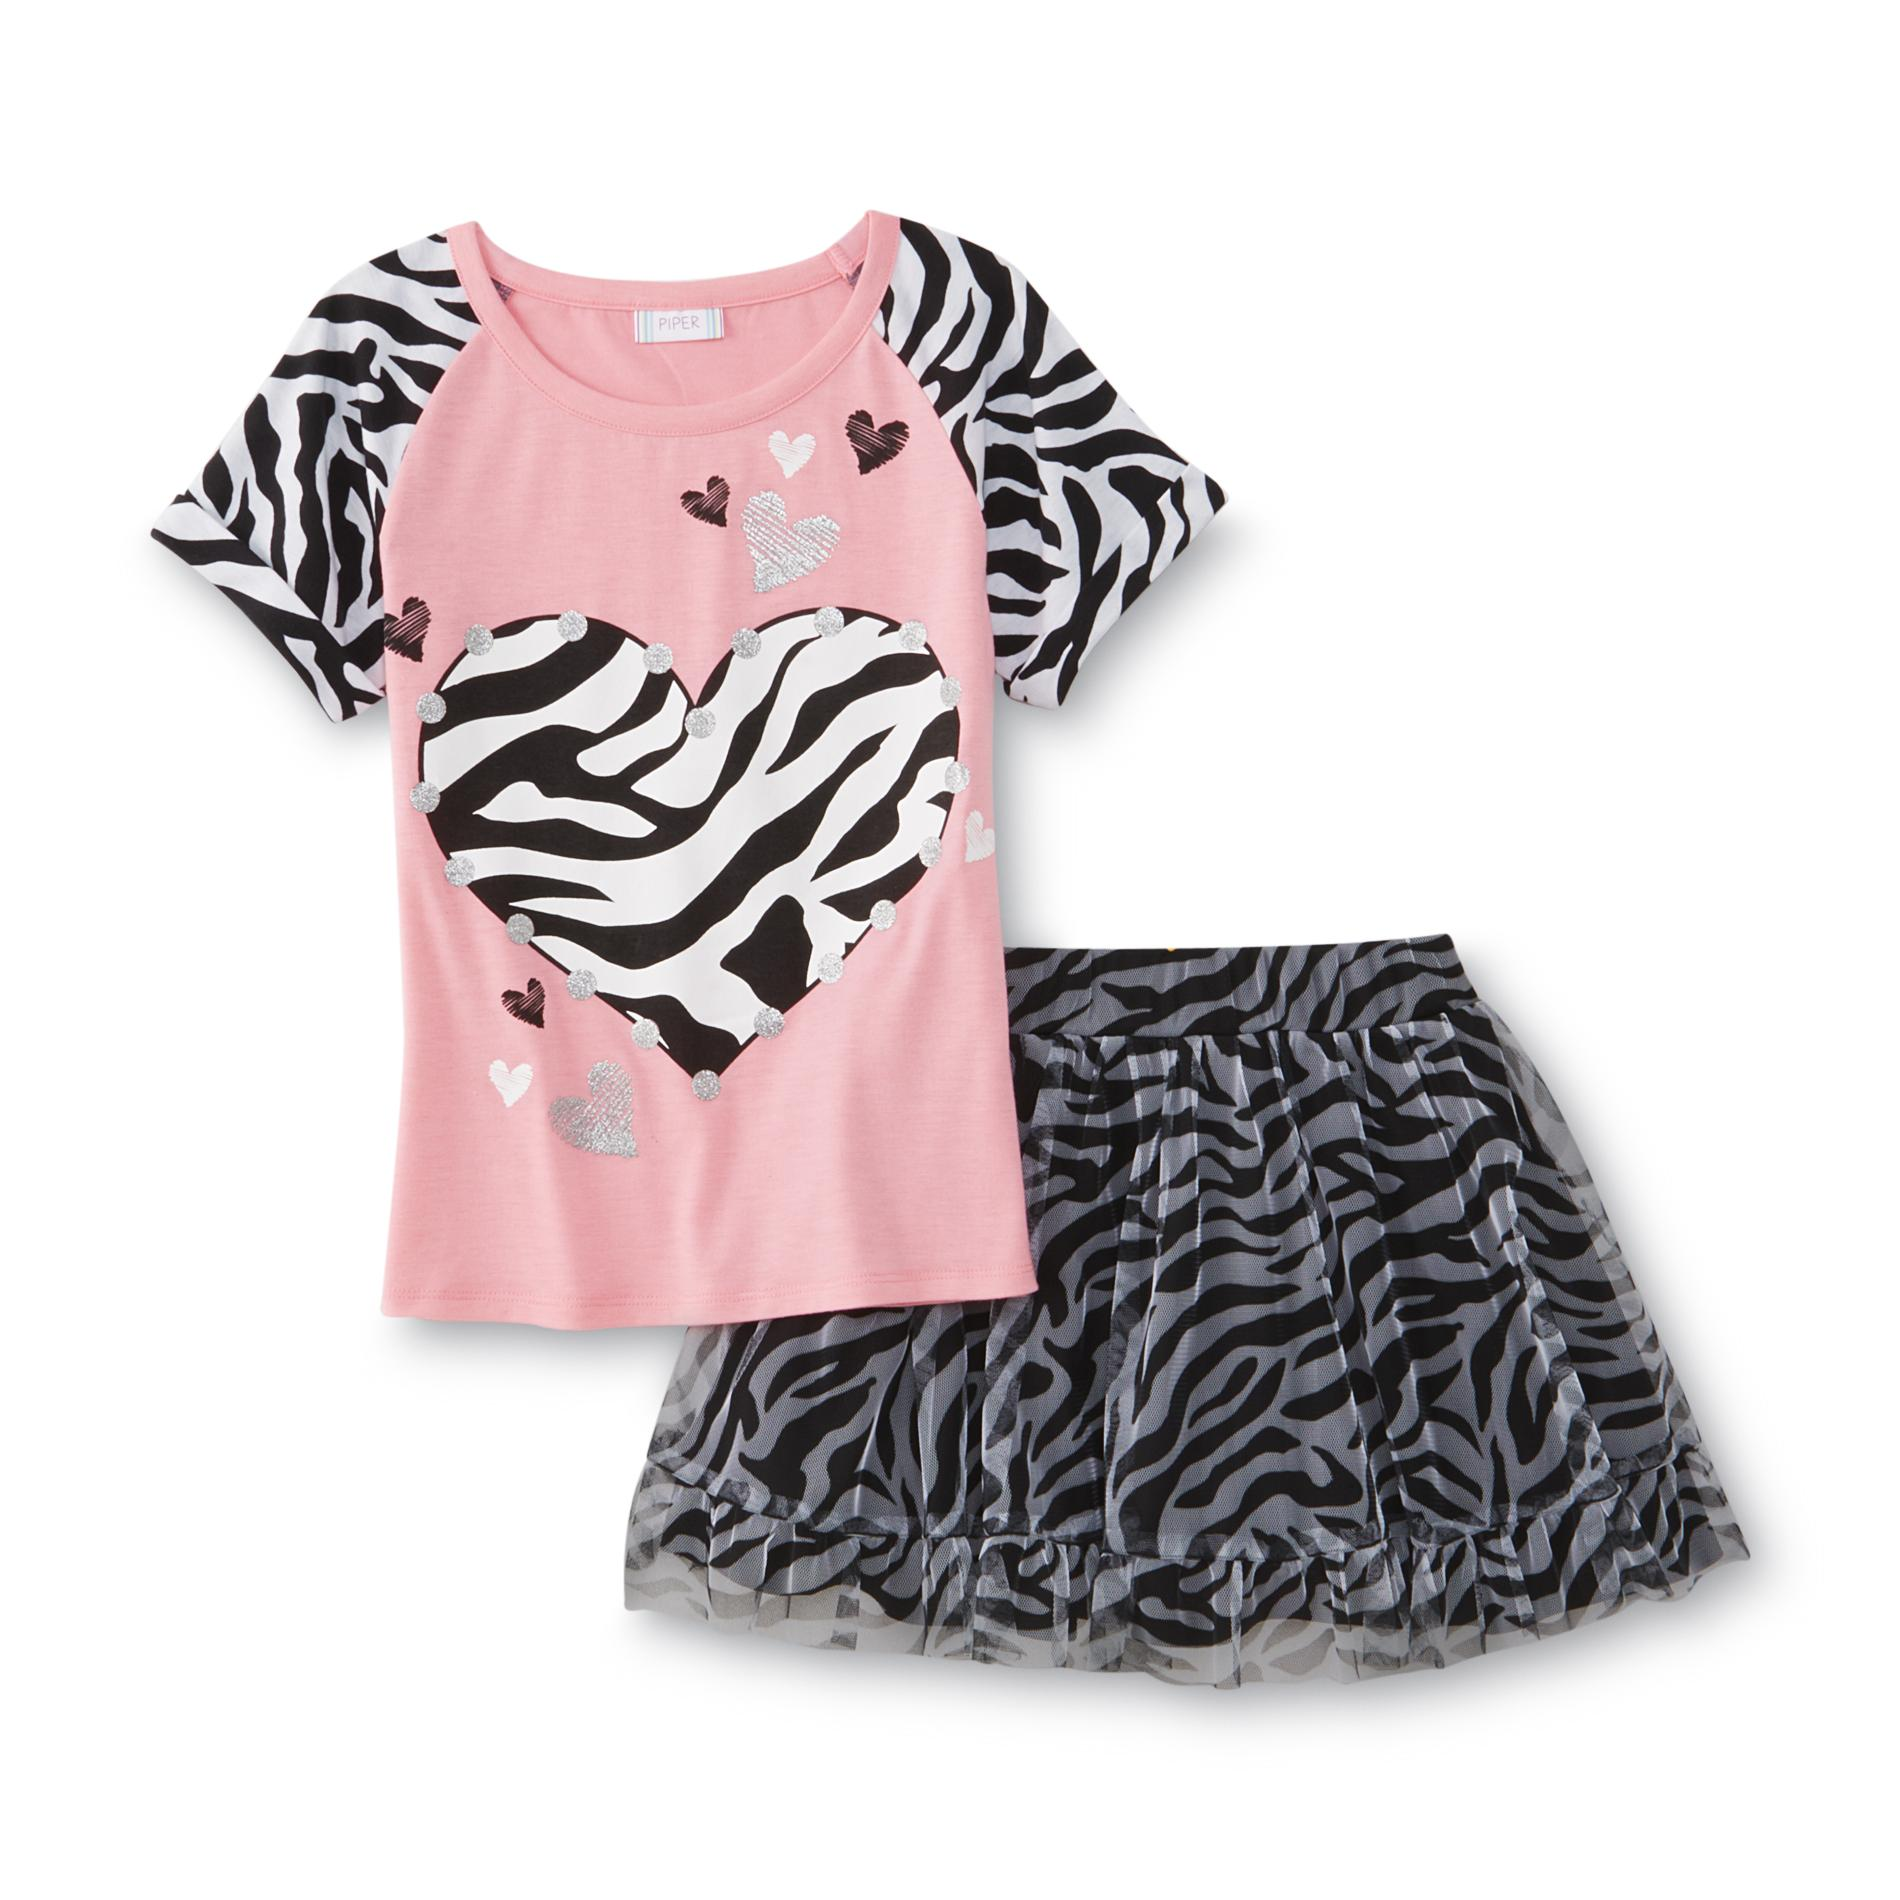 Piper Girl's Graphic T-Shirt & Skirt - Hearts & Zebra Print PartNumber: 049VA82720812P MfgPartNumber: 22522VMKM